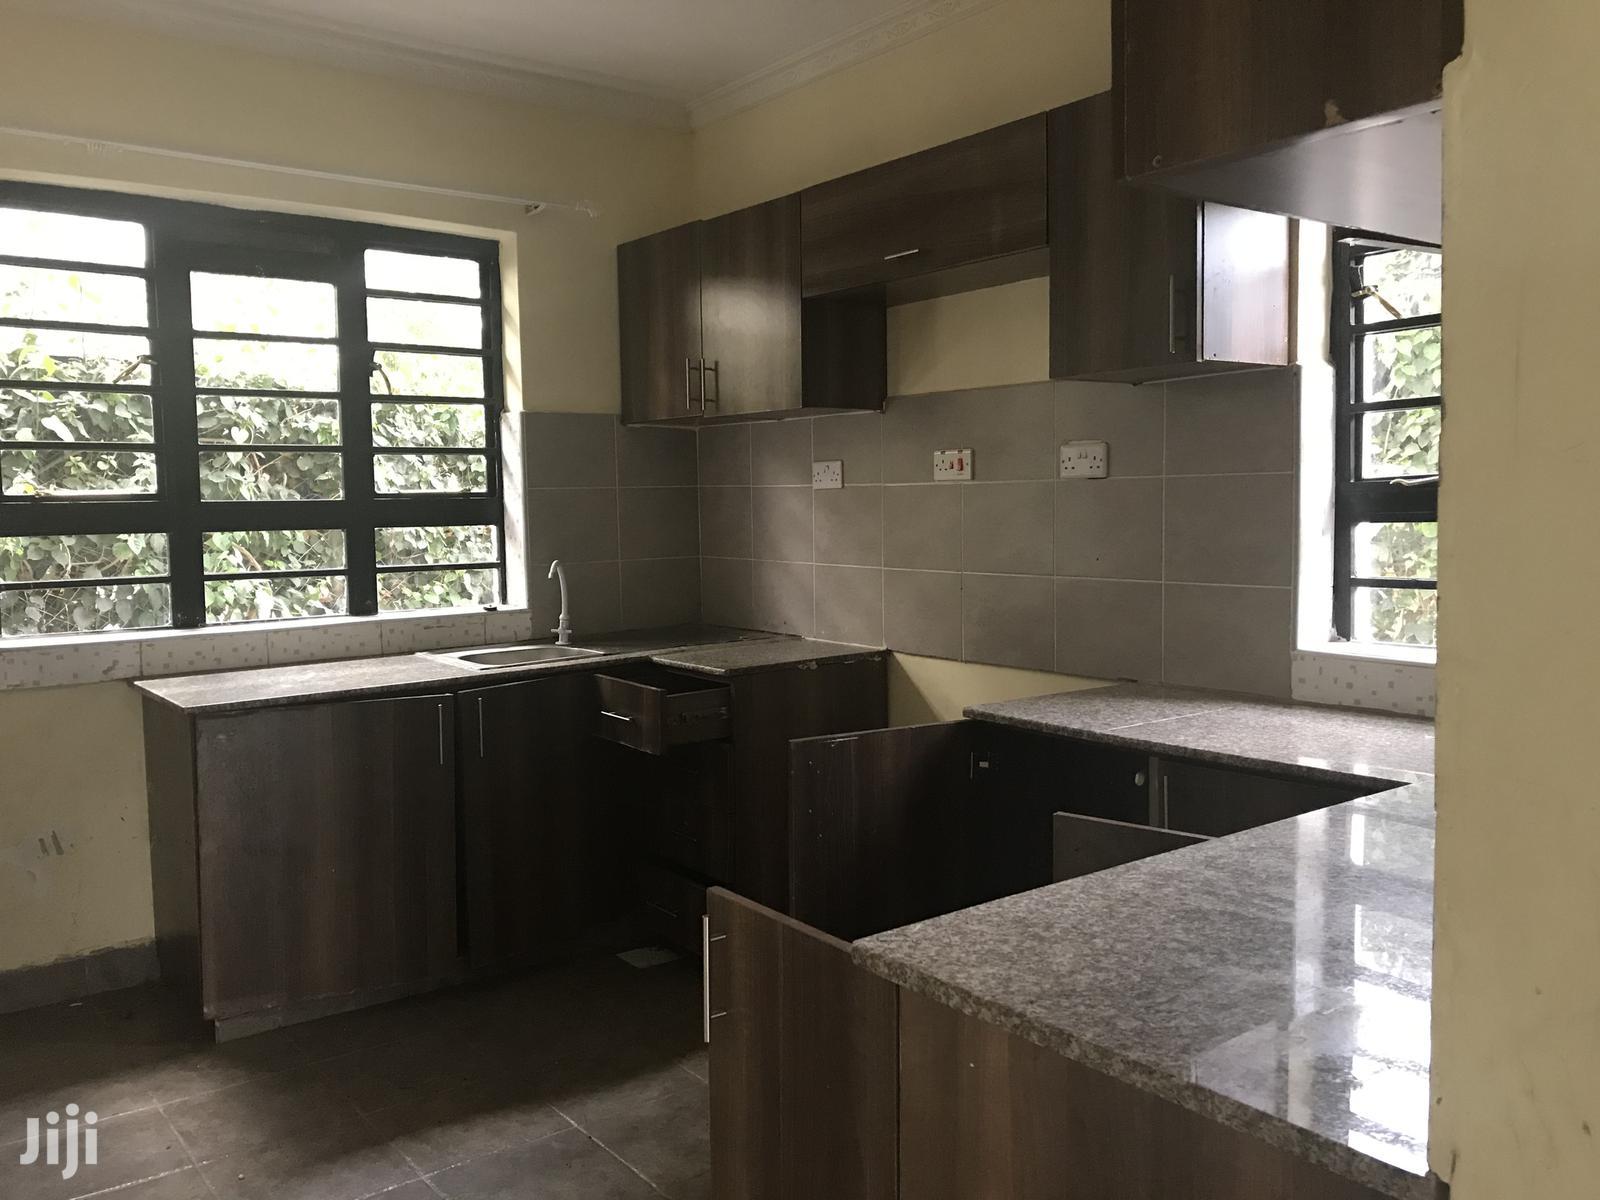 4bedroom +S/Quators Syokimau | Houses & Apartments For Rent for sale in Syokimau, Machakos, Kenya